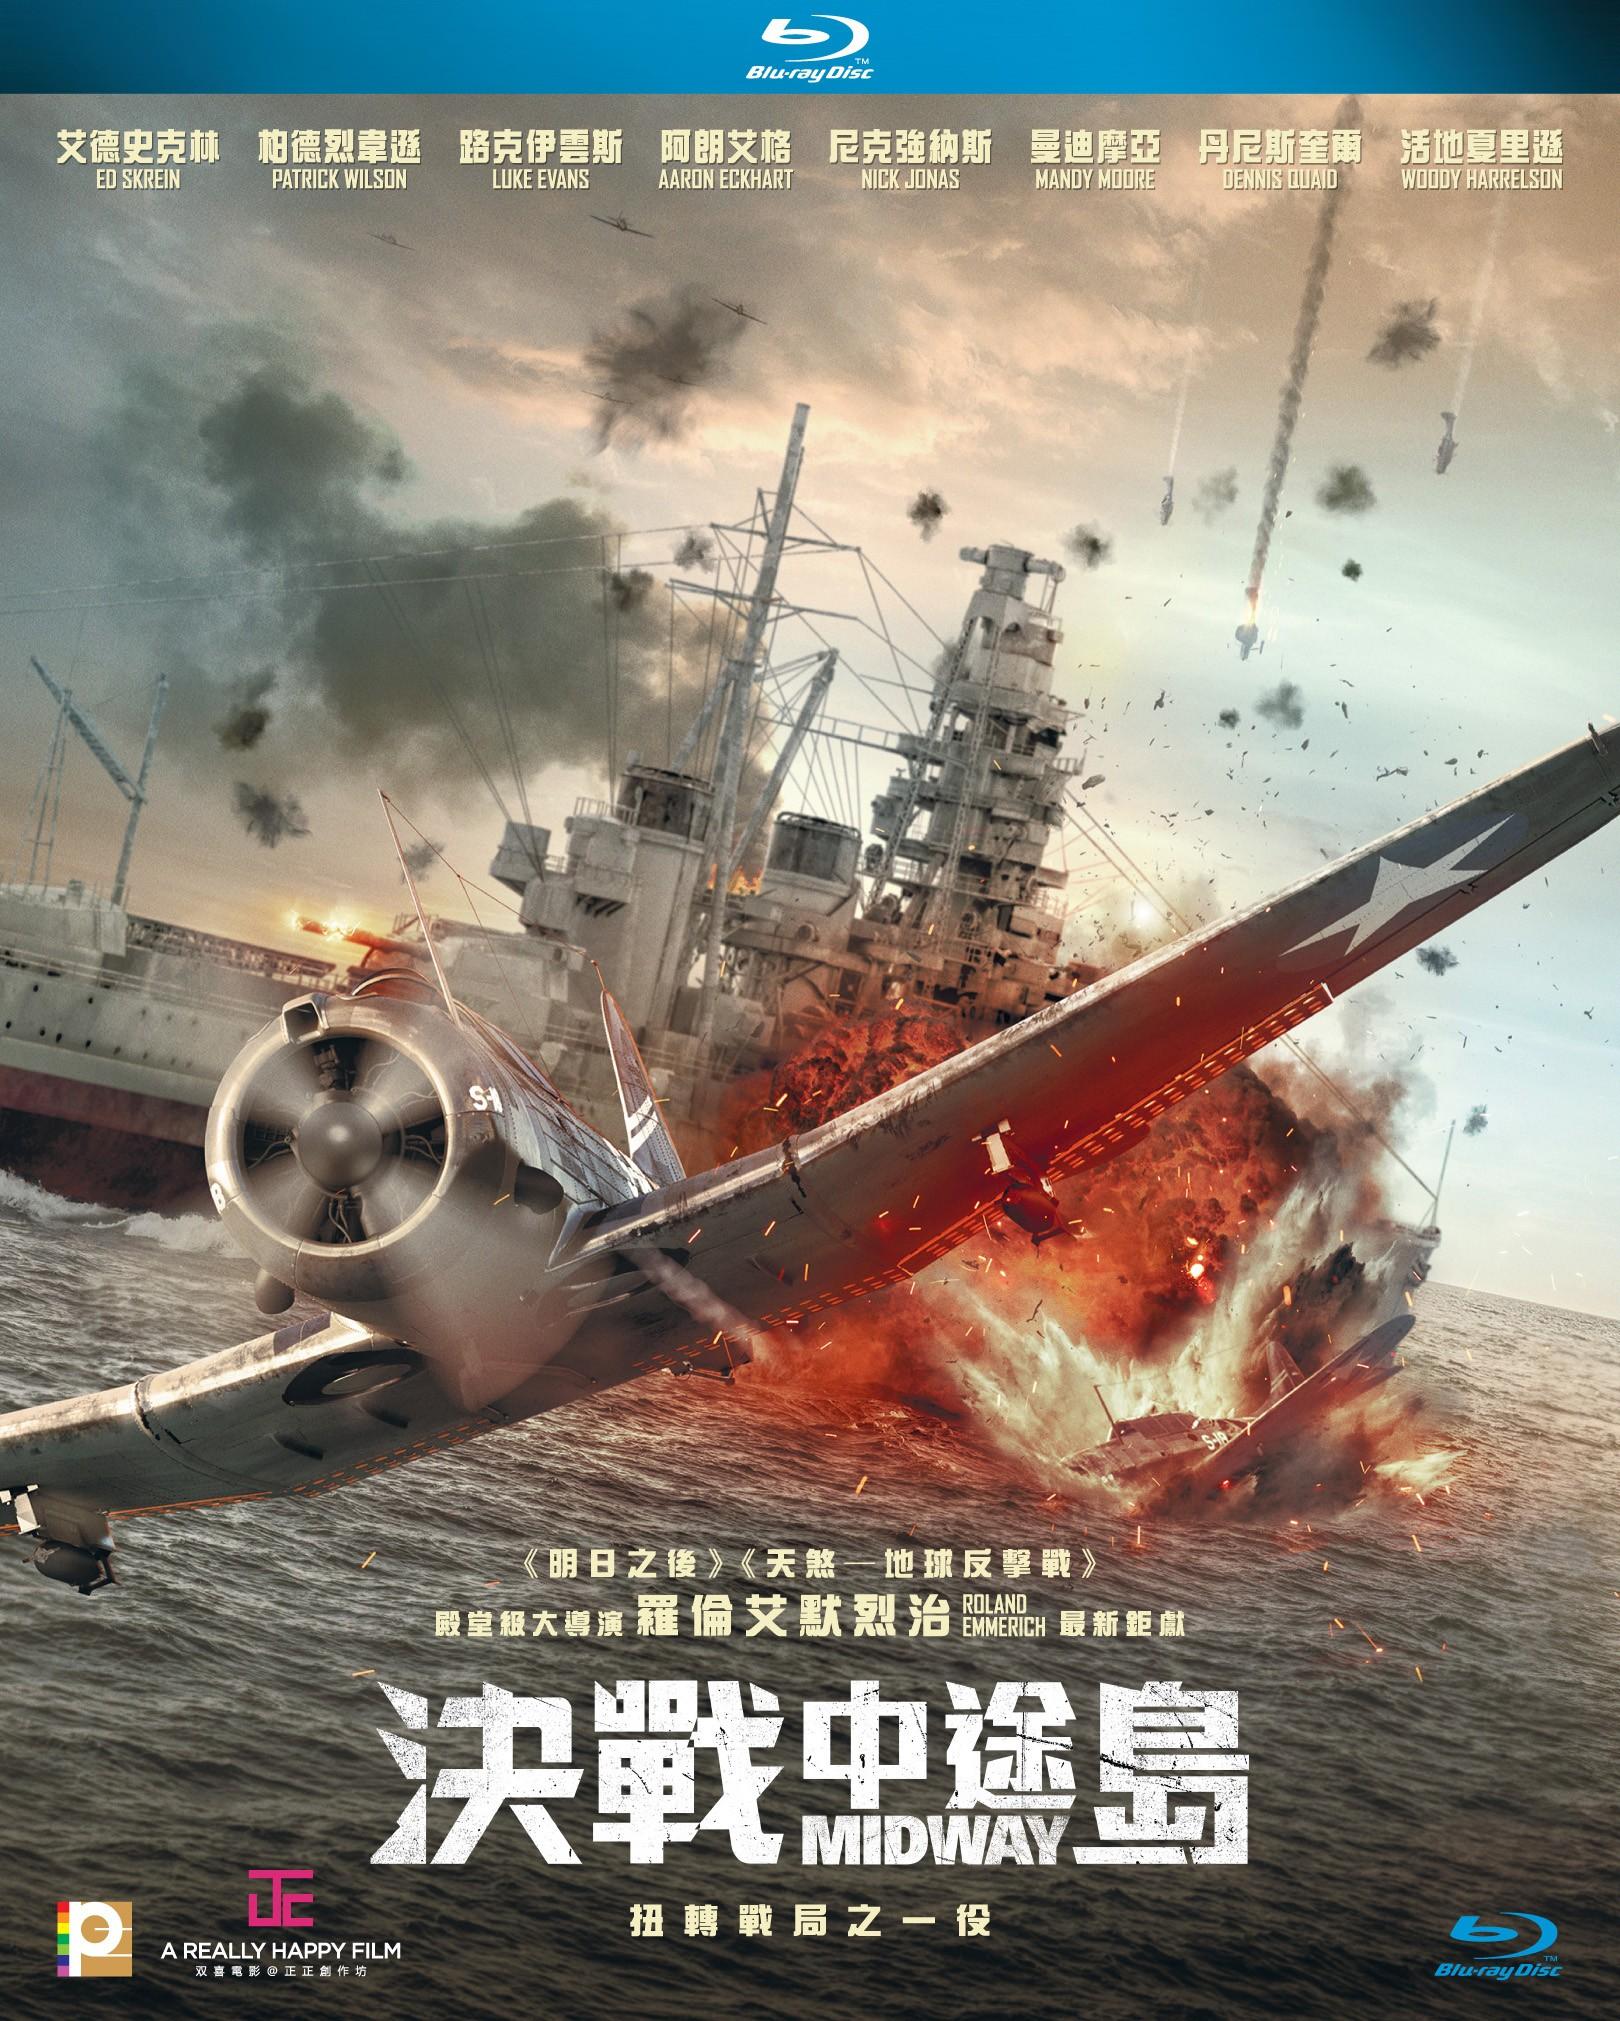 https://shop.panorama.com.hk/hk/war/3368--4.html